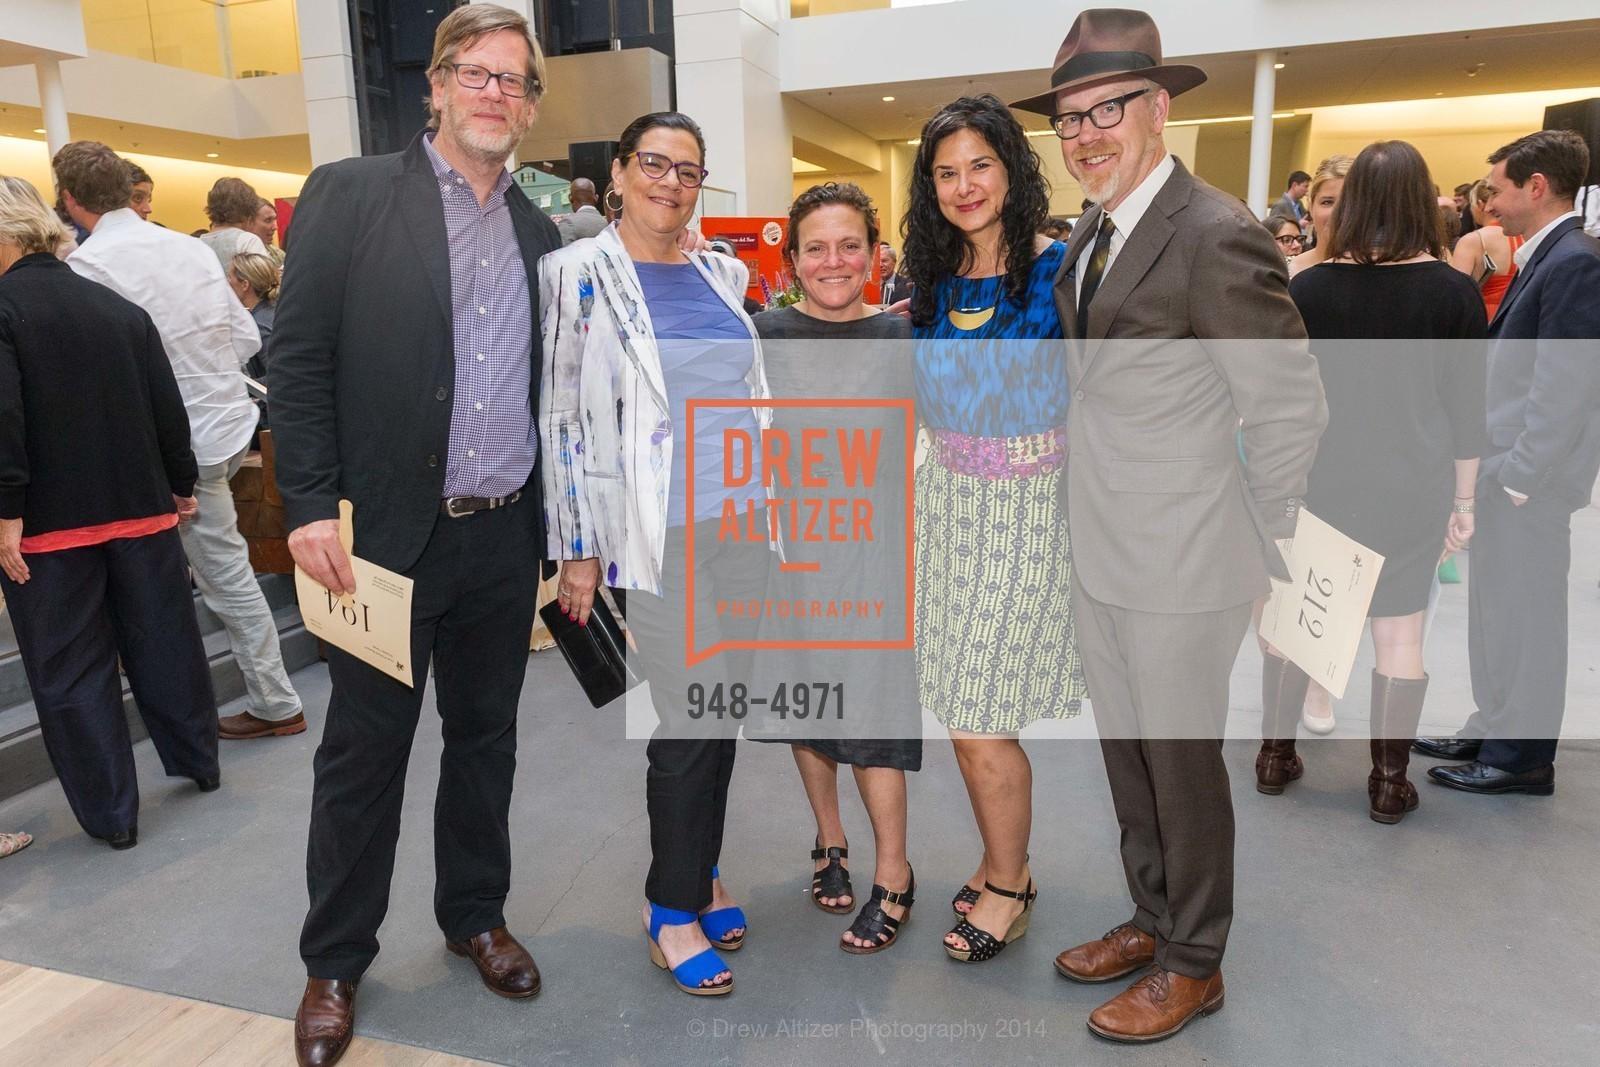 Andy Rappaport, Deborah Rappaport, Traci Des Jardin, Rebecca ?, Adam Savage, Photo #948-4971